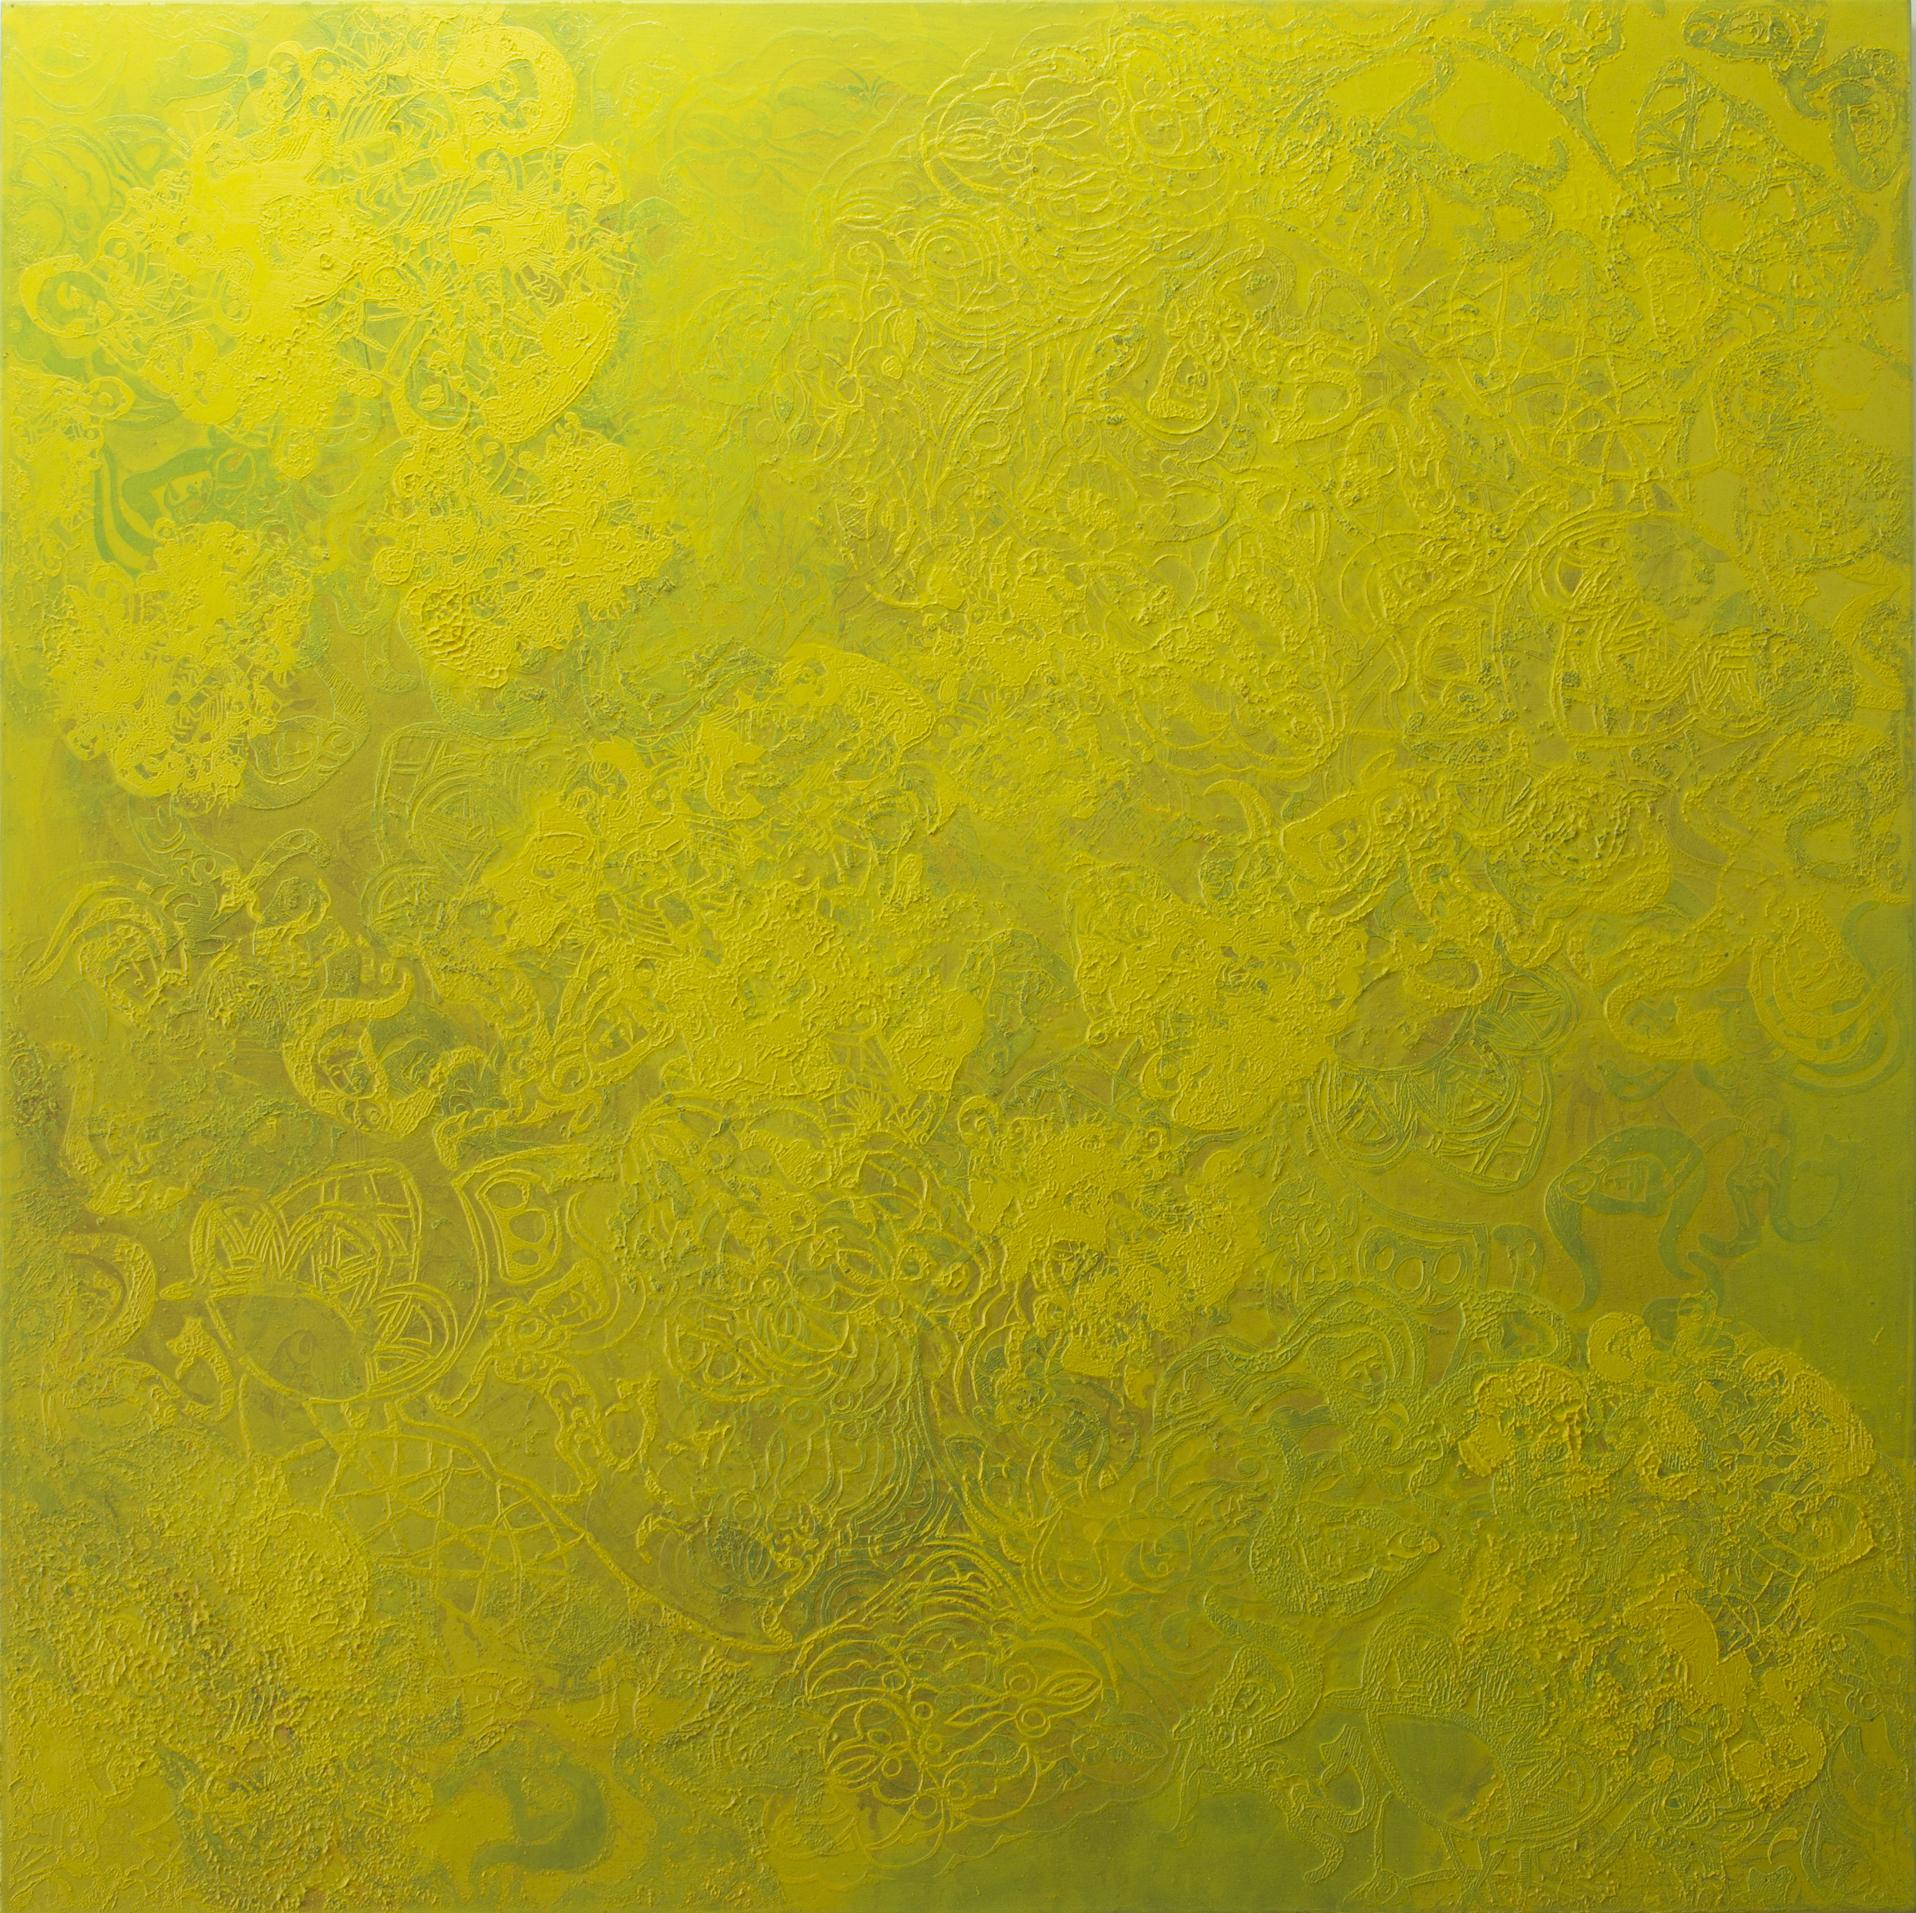 """Tempelspur"", 2012, Detail, 120 x 120 cm, Öl auf Leinwand"